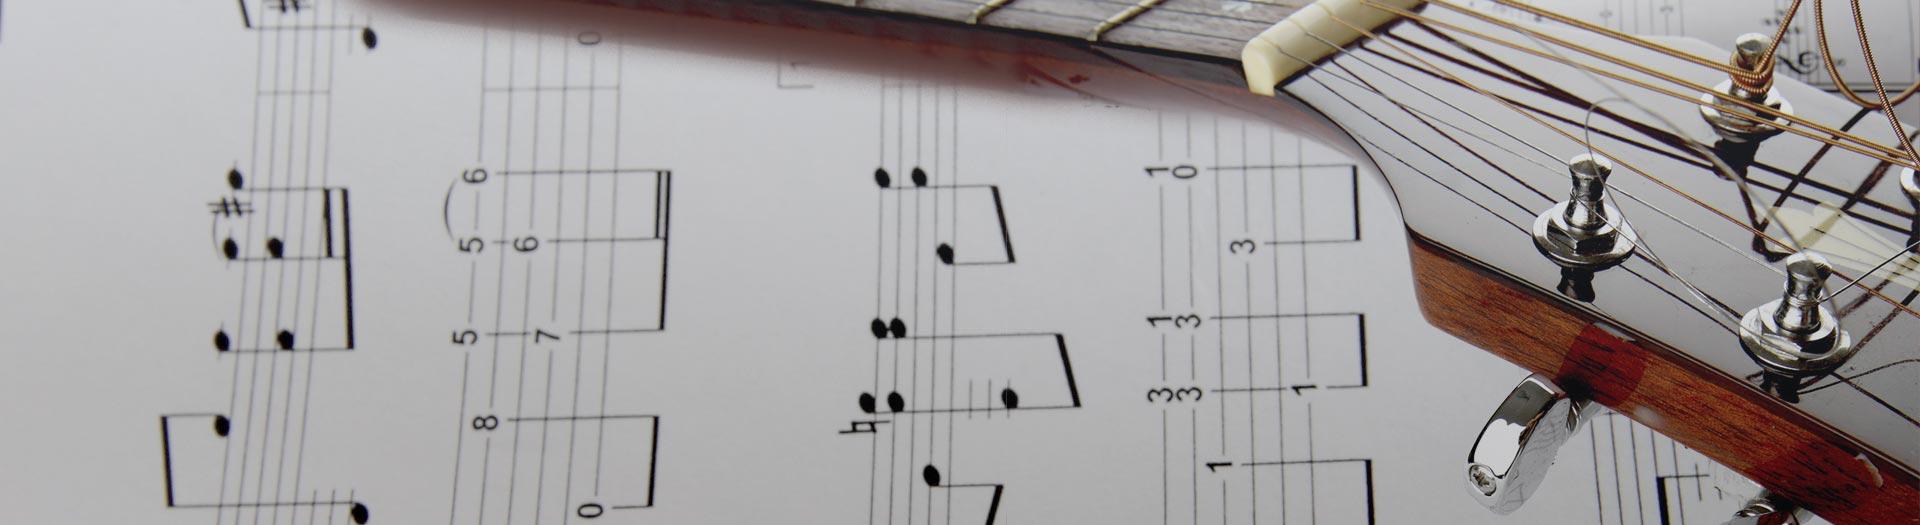 Nauka gry<br />na gitarze